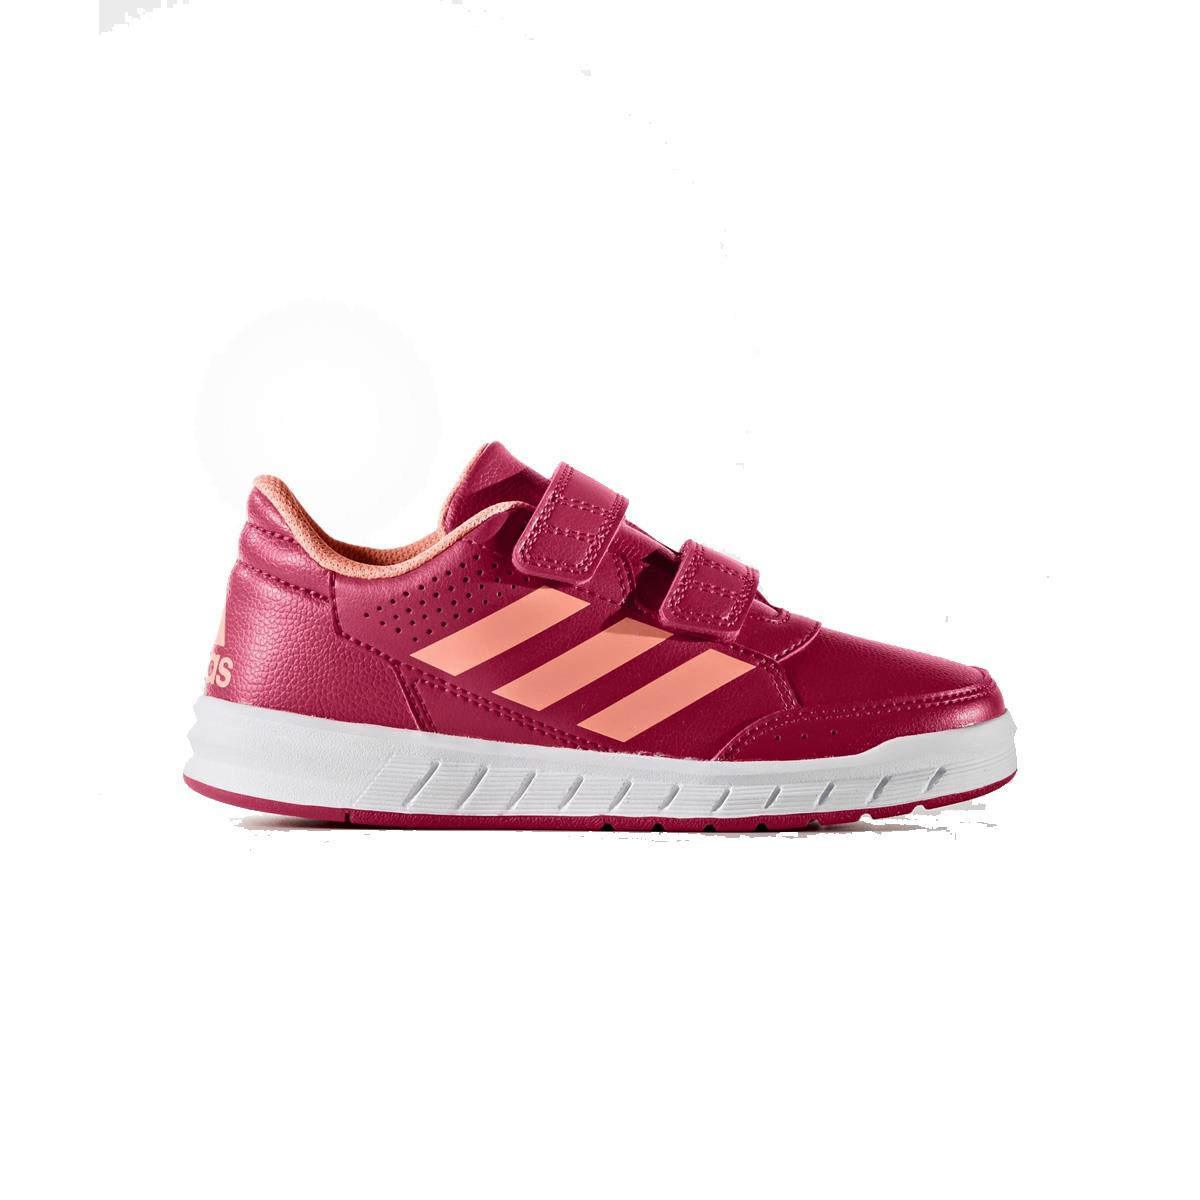 4eb094f62f2 Tênis Adidas Altasport CF K Infantil